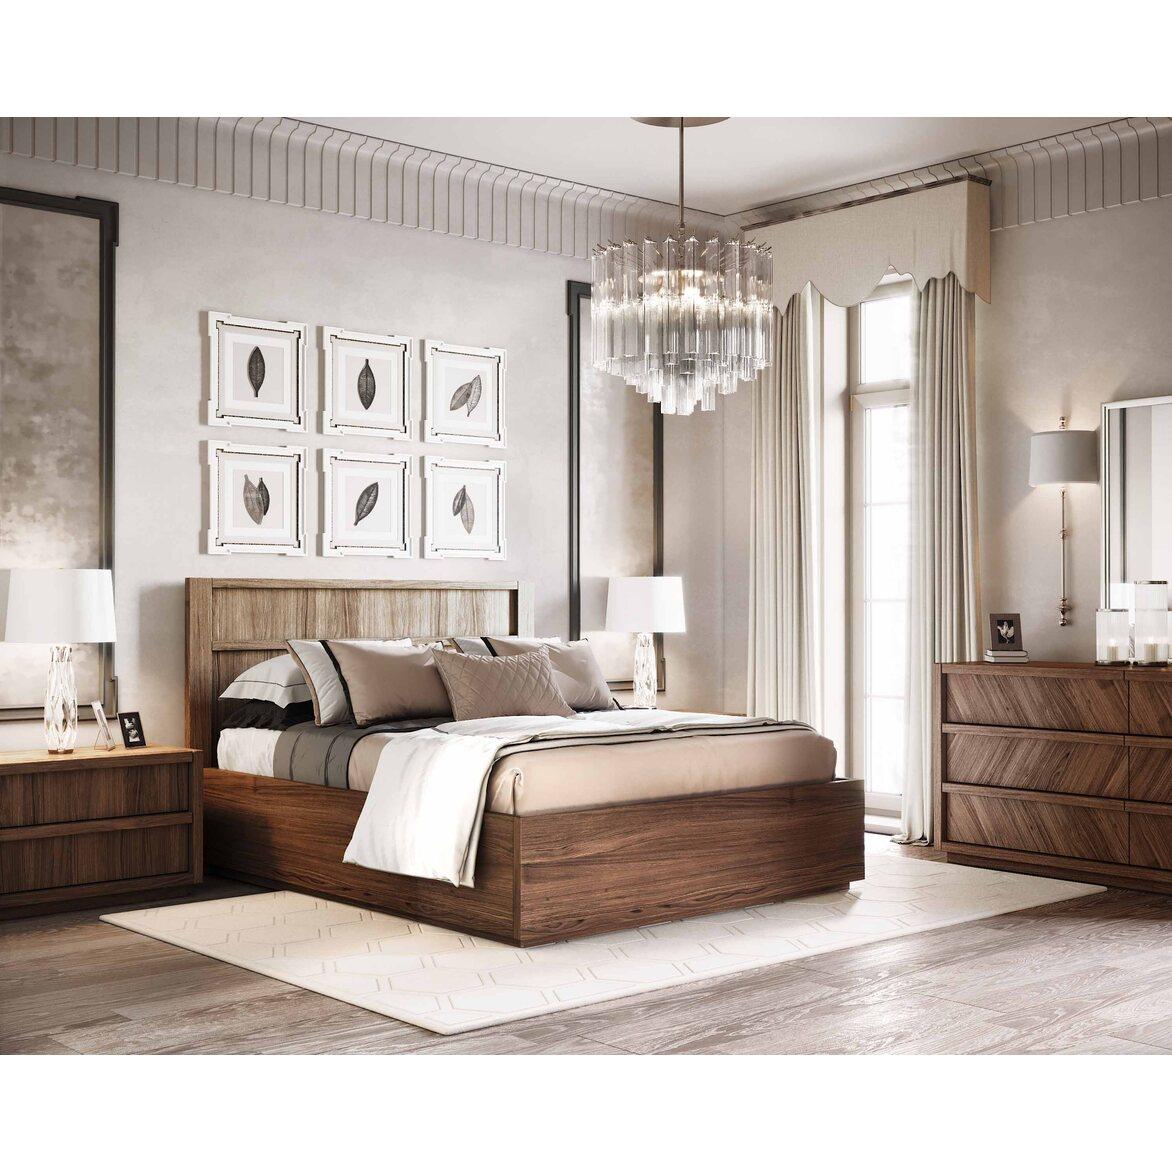 "Кровать 160*200 ""Brenson"" 4 | Двуспальные кровати Kingsby"